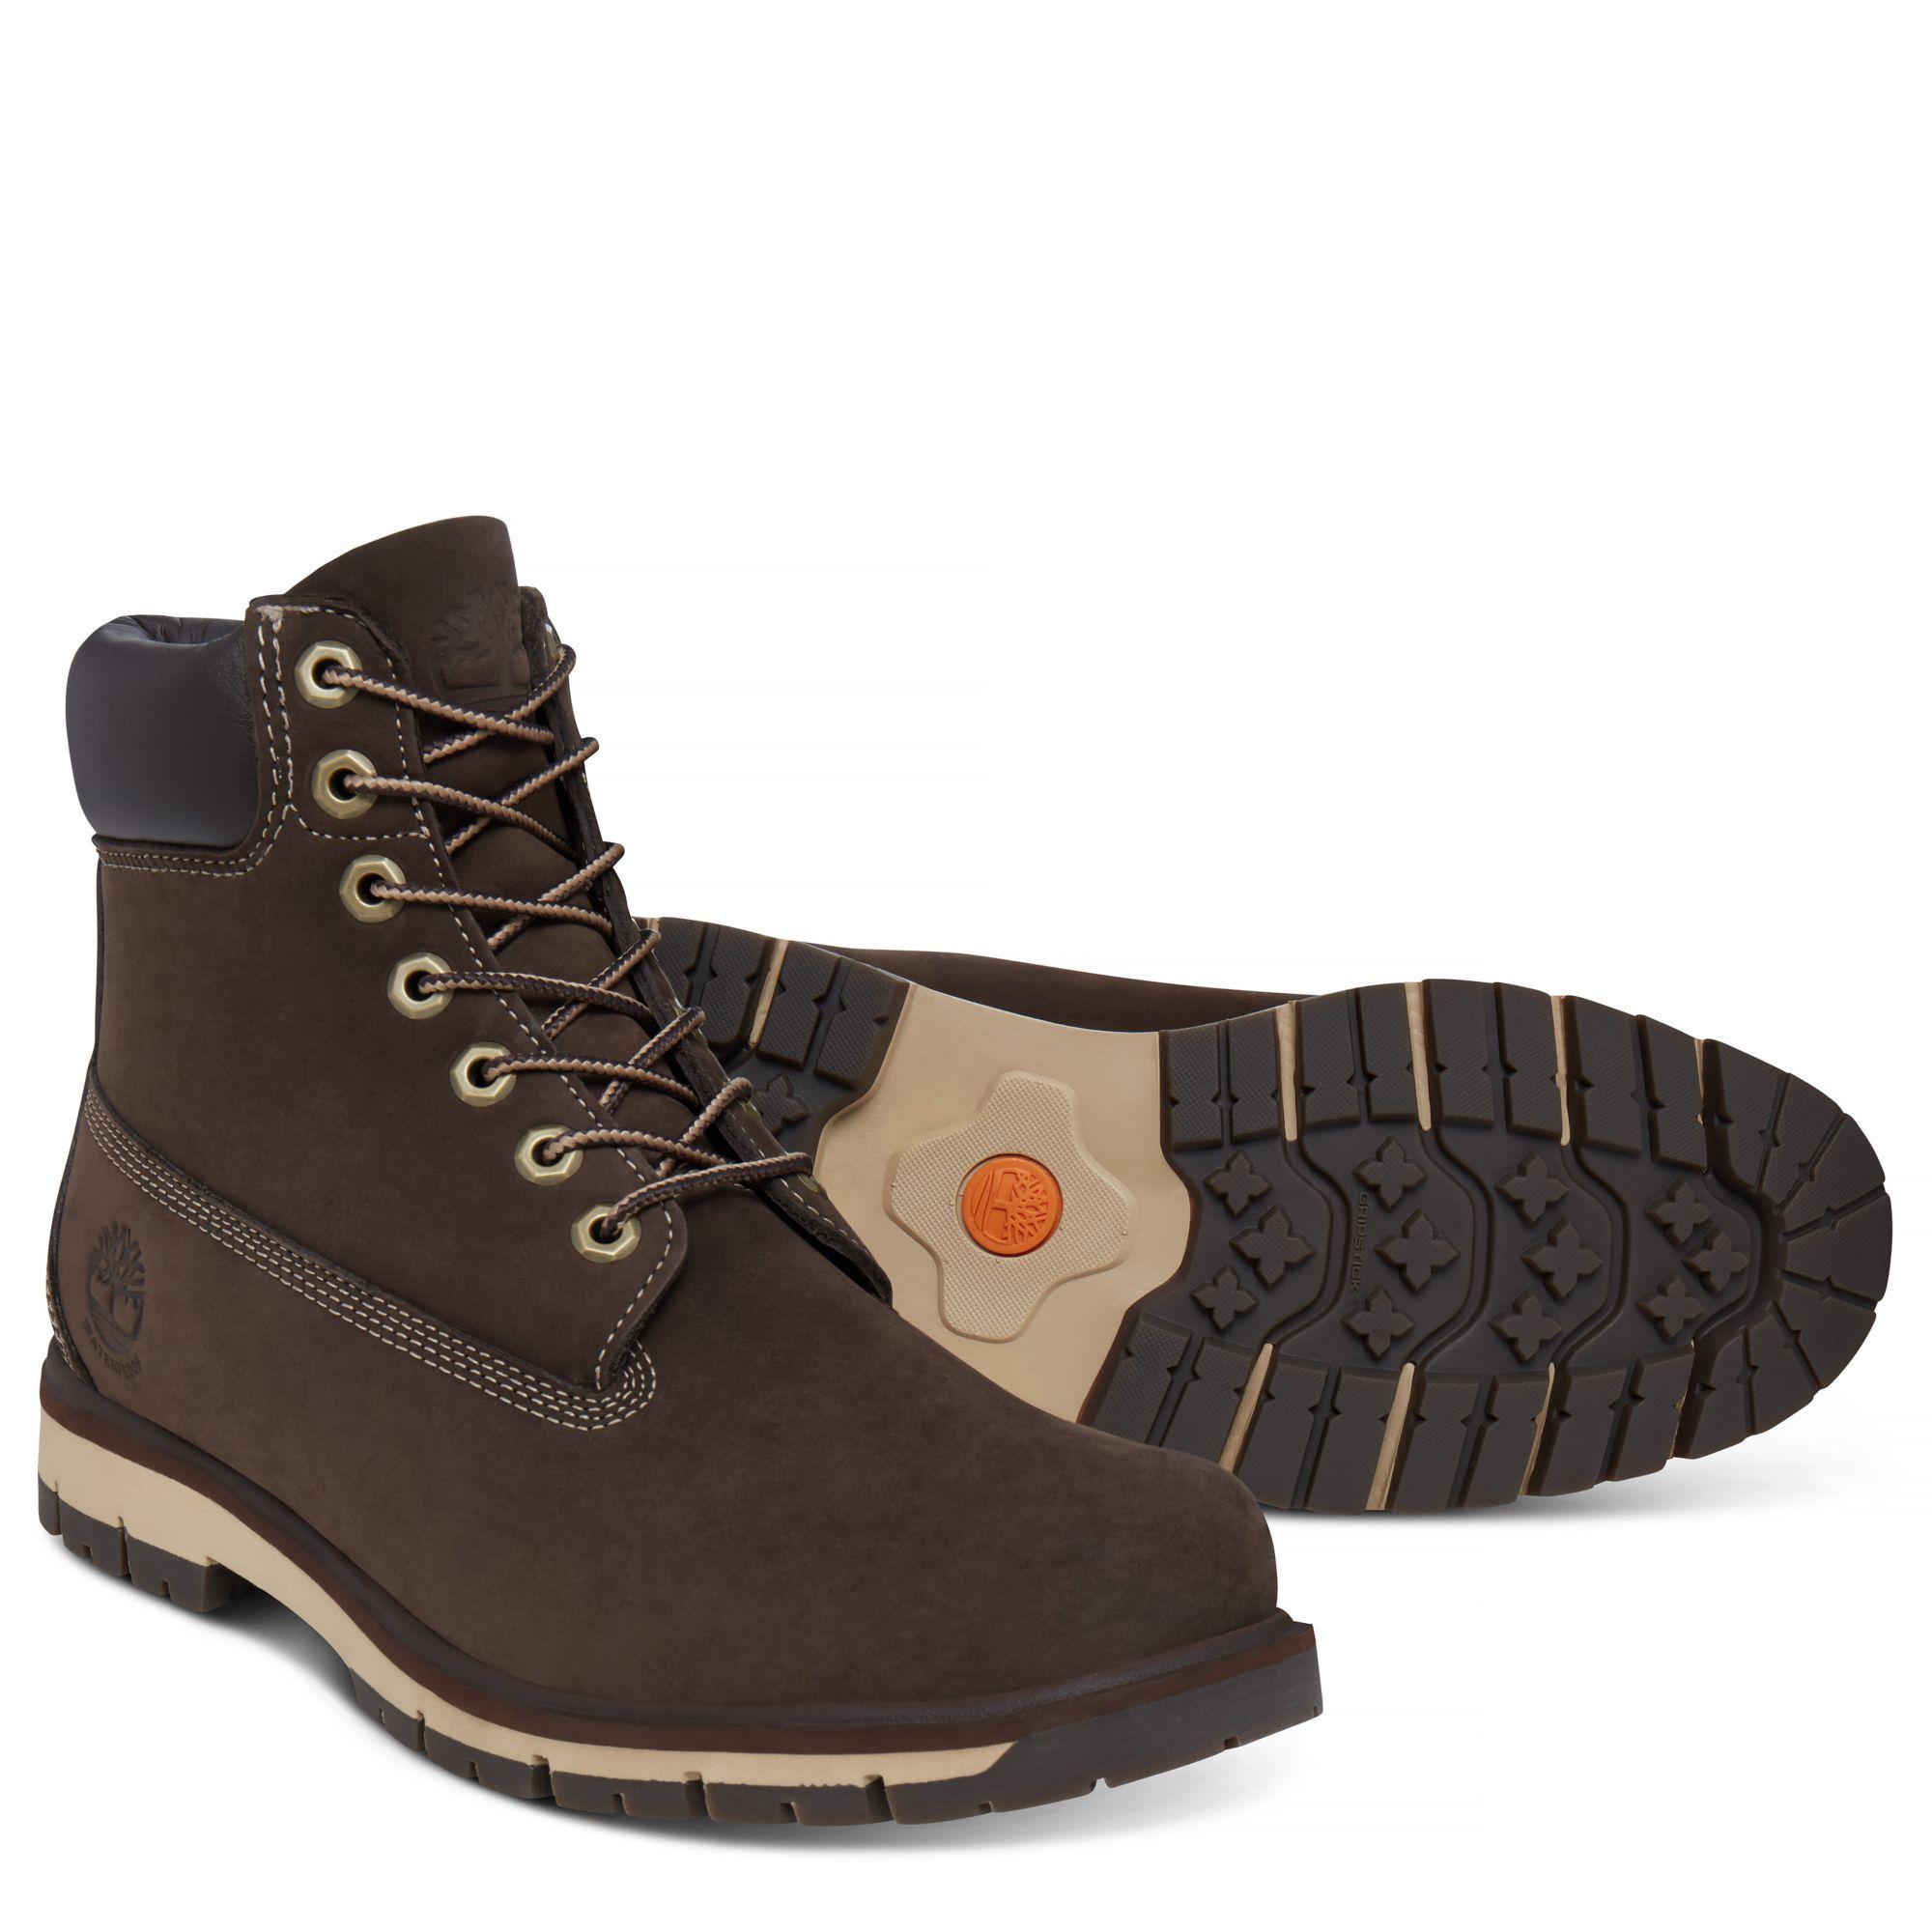 Boots Inch Dunkelbraun Übergröße Timberland 6 Radford J3tklf1uc5 OXiPkTuZ